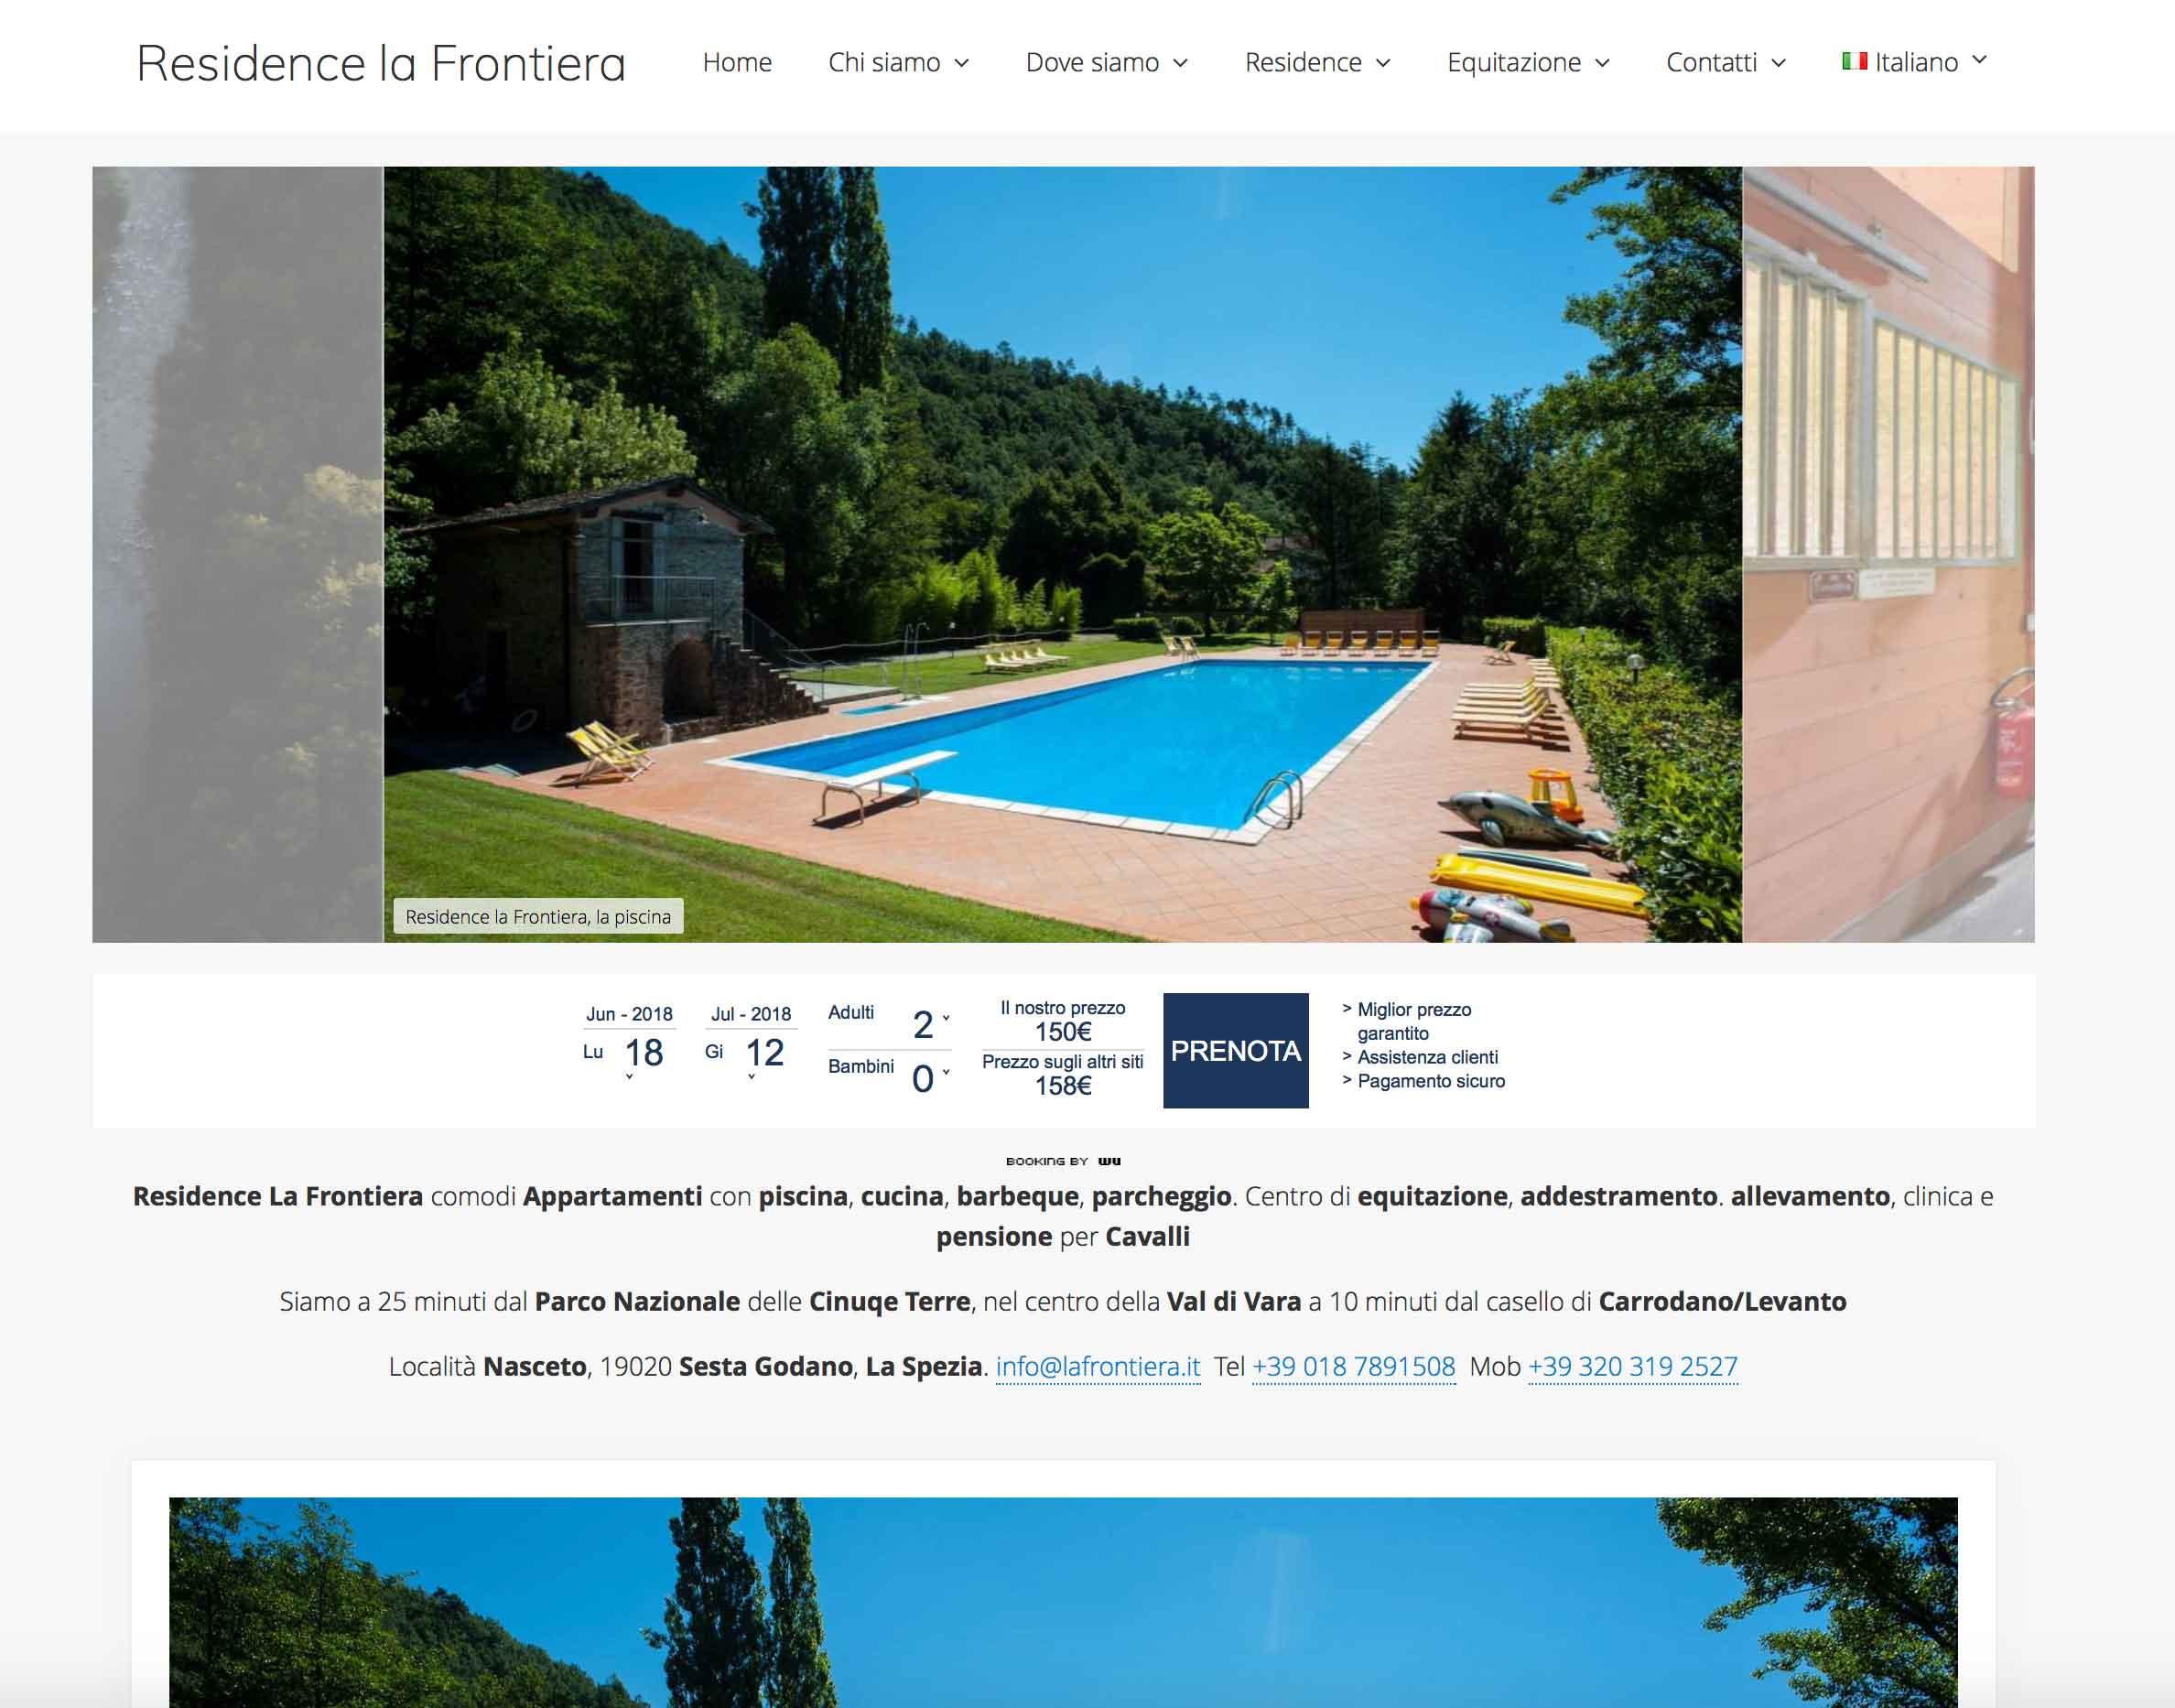 Residence La Frontiera -  Nuovo sito internet 1